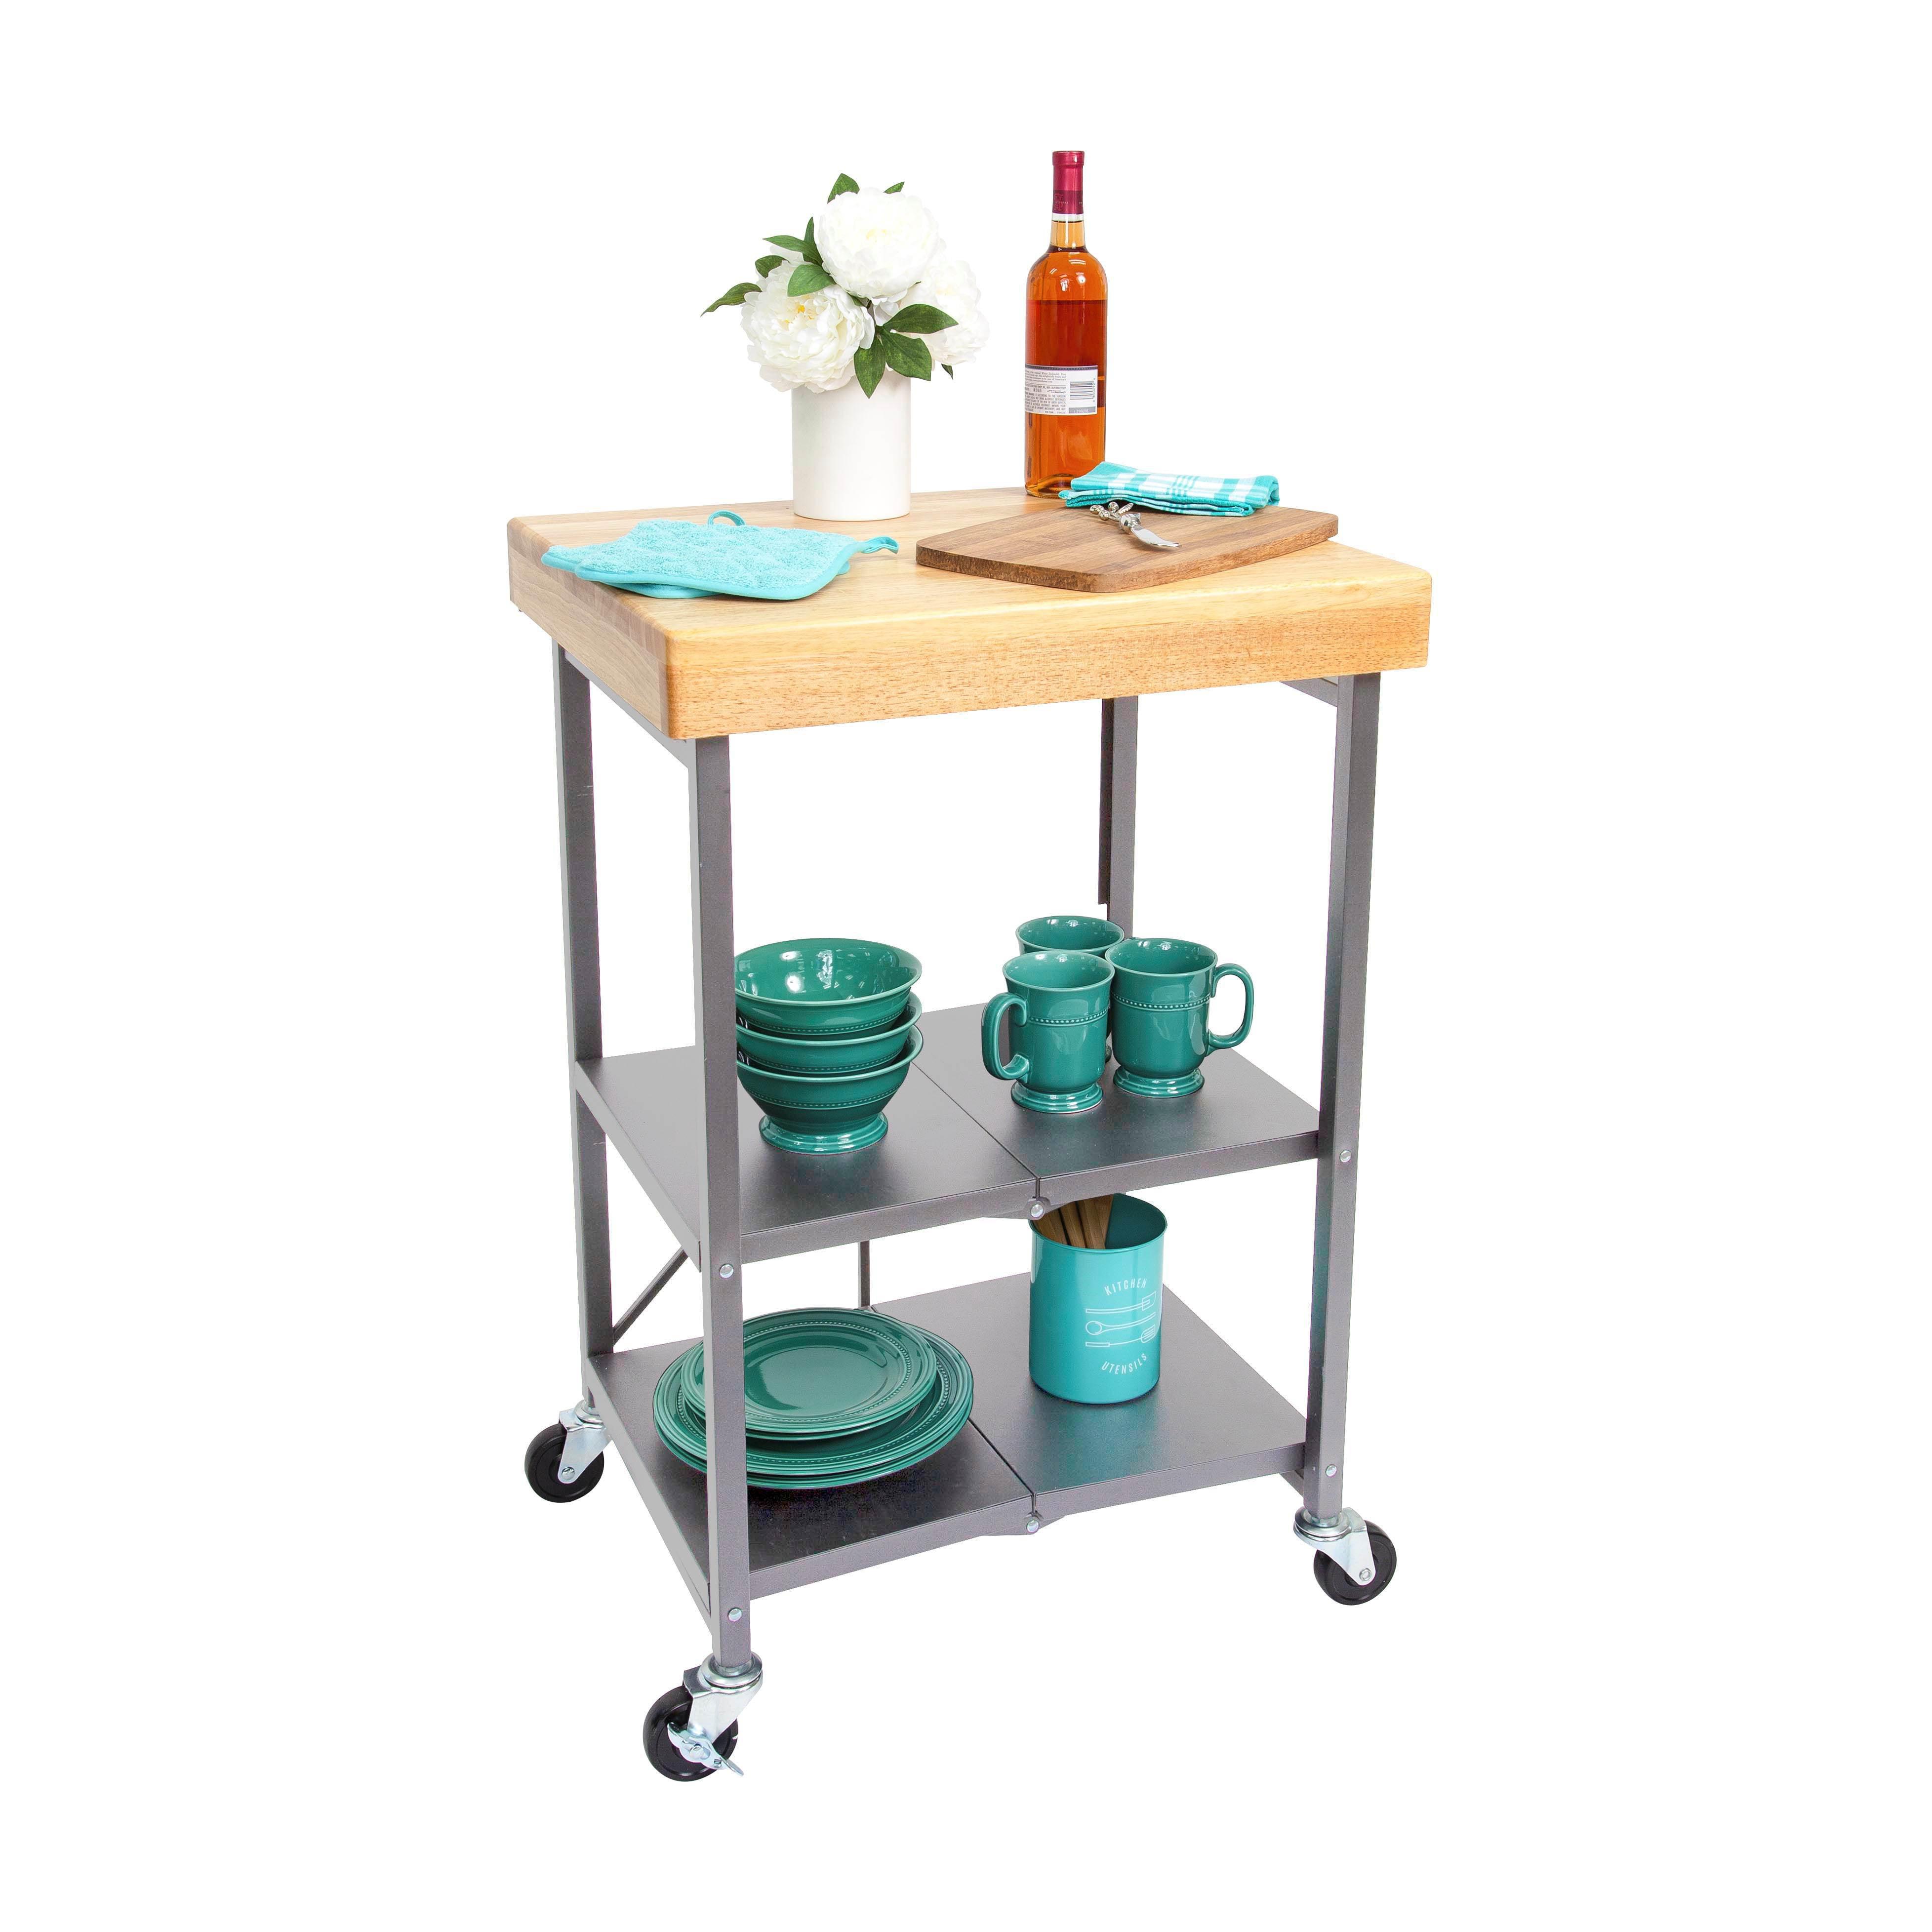 Origami Folding Kitchen Island Cart - 6800500 | Kitchen island ... | 3912x3912